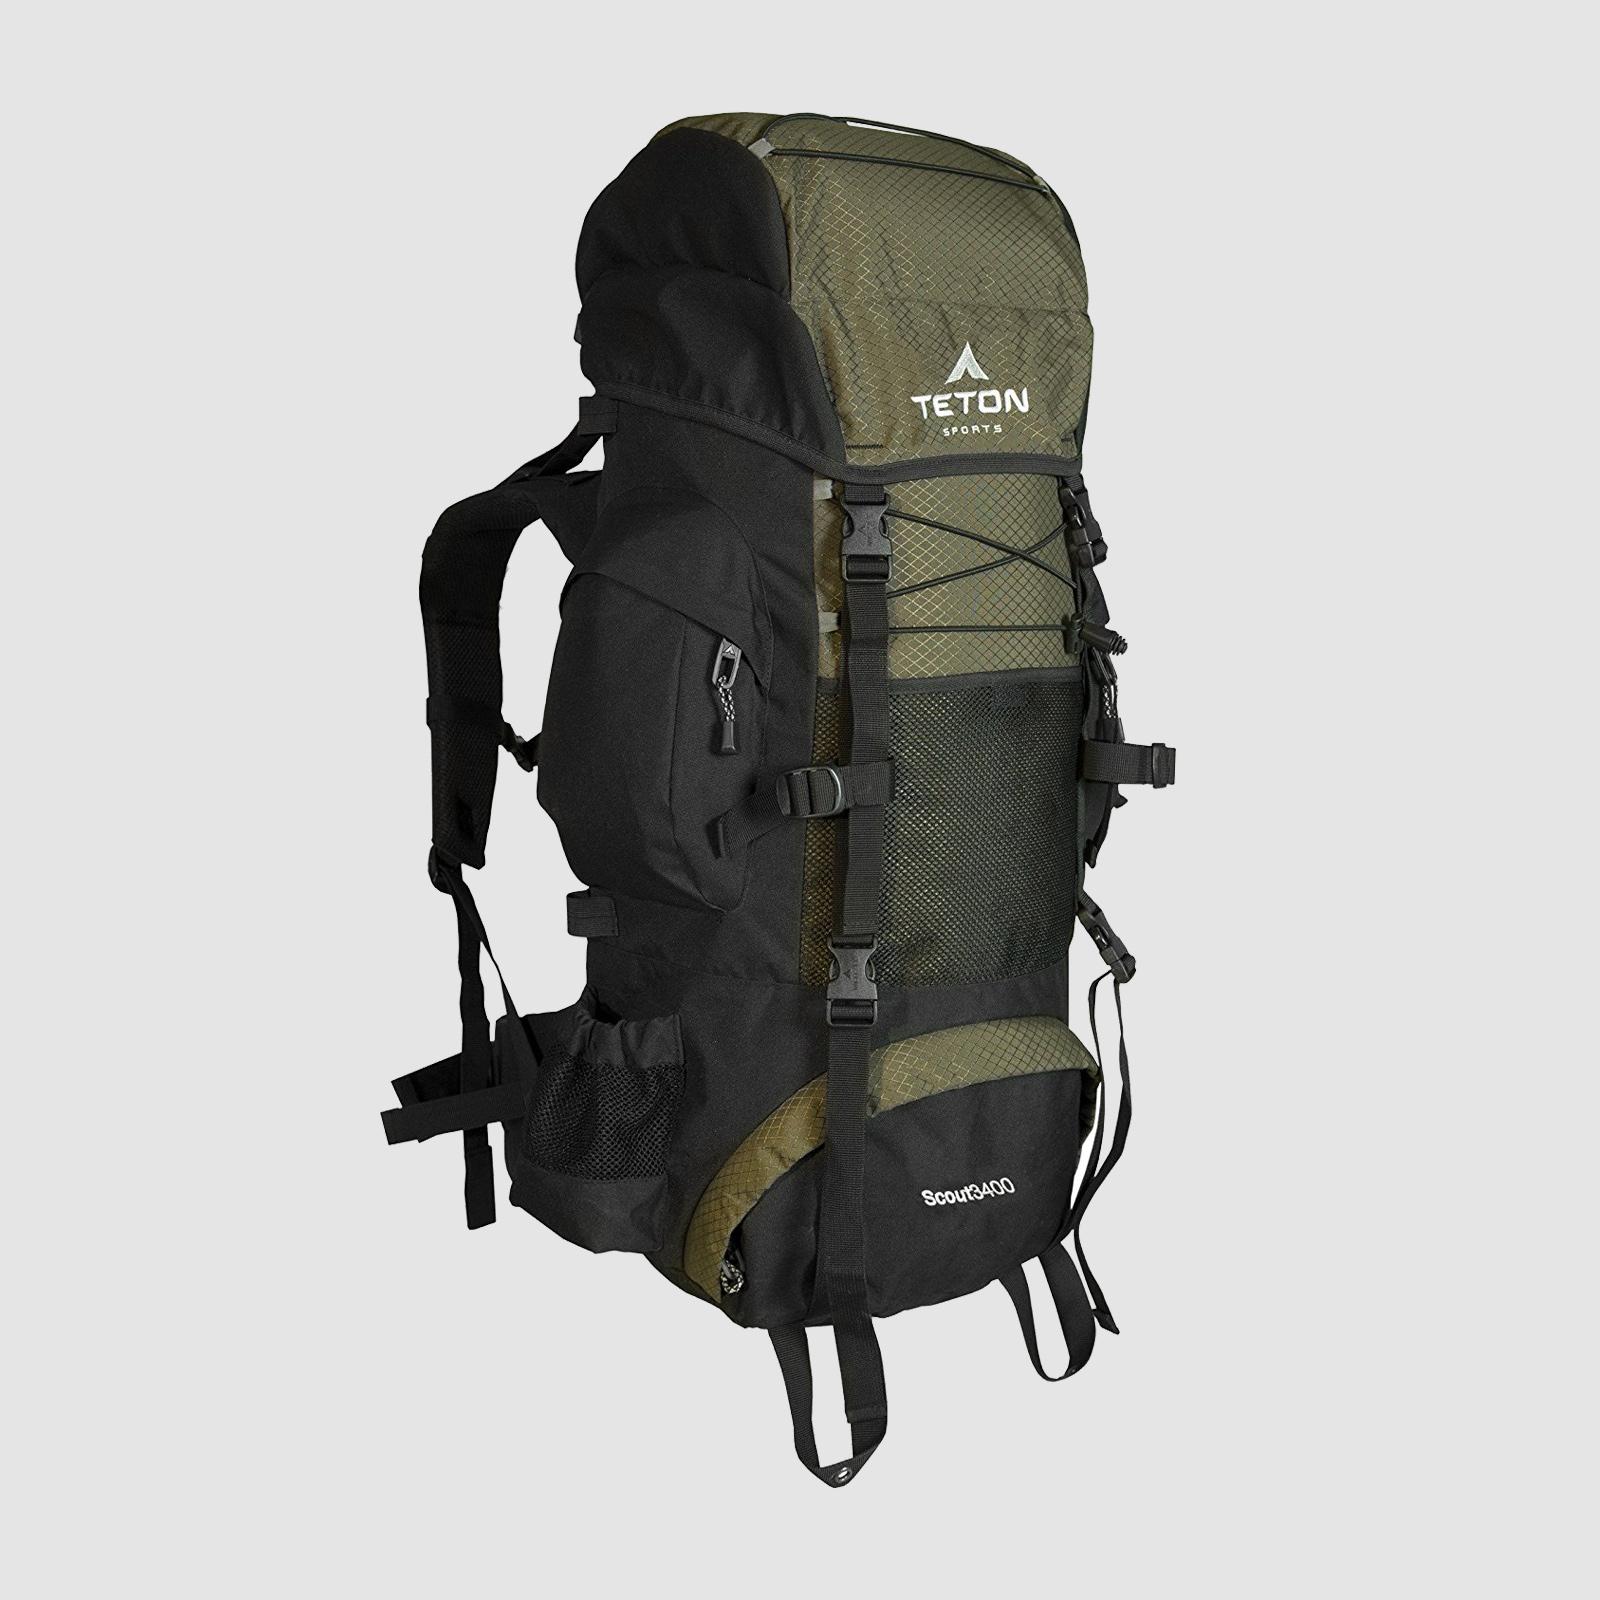 Teton Sports Scout 3400 Internal Frame Backpack | $55-$60 | Amazon